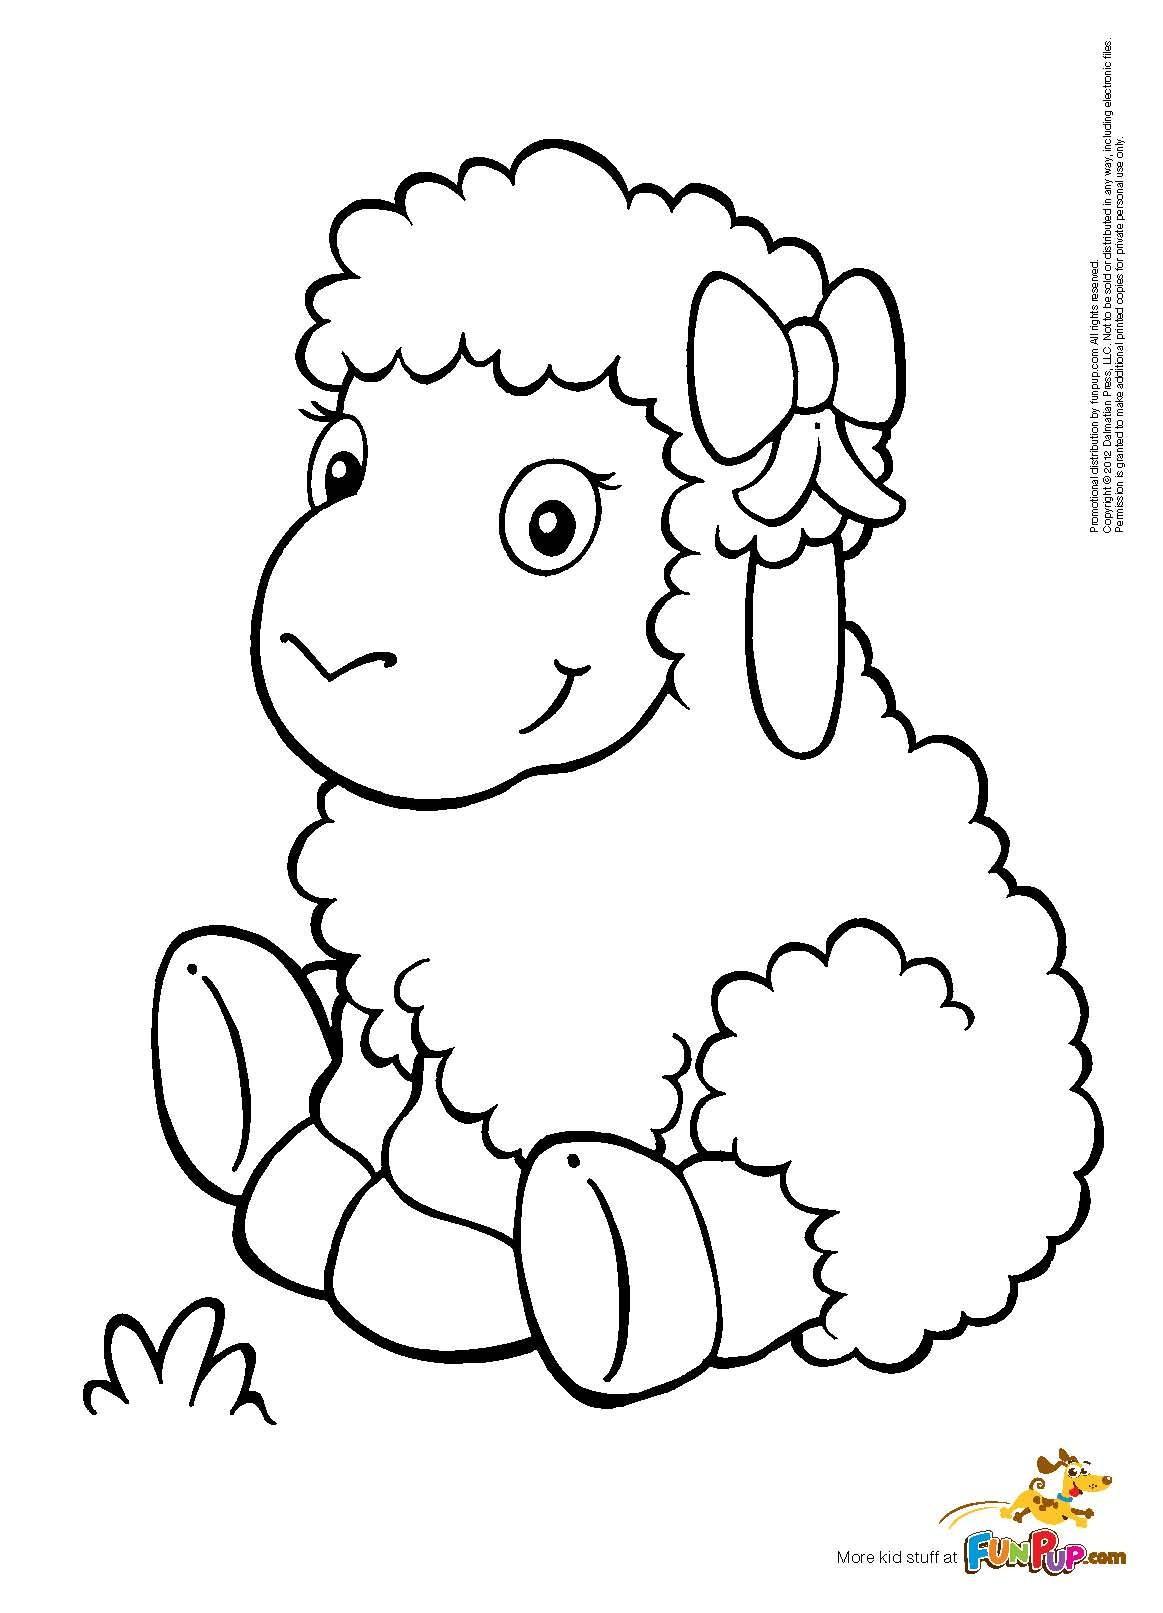 Baby Lamb Drawing at GetDrawings.com | Free for personal ...